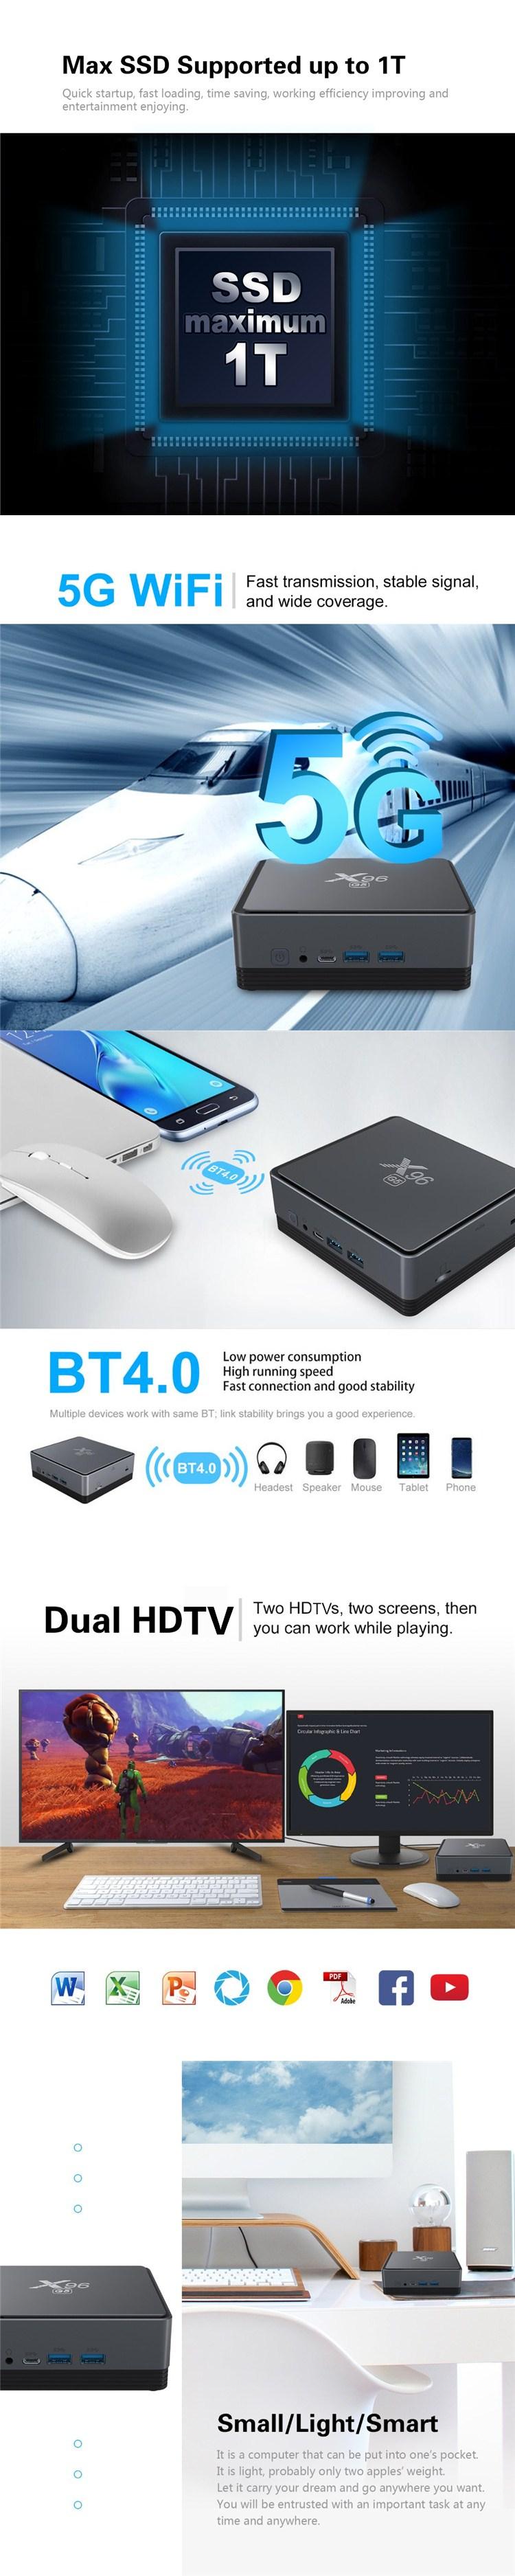 Factory directly with 2020 X96 G5 Z83-V TVBOX VGA port for Windos 10 MINI PC Intel Mini Pc Dual Band Wifi 2G 32G z83v